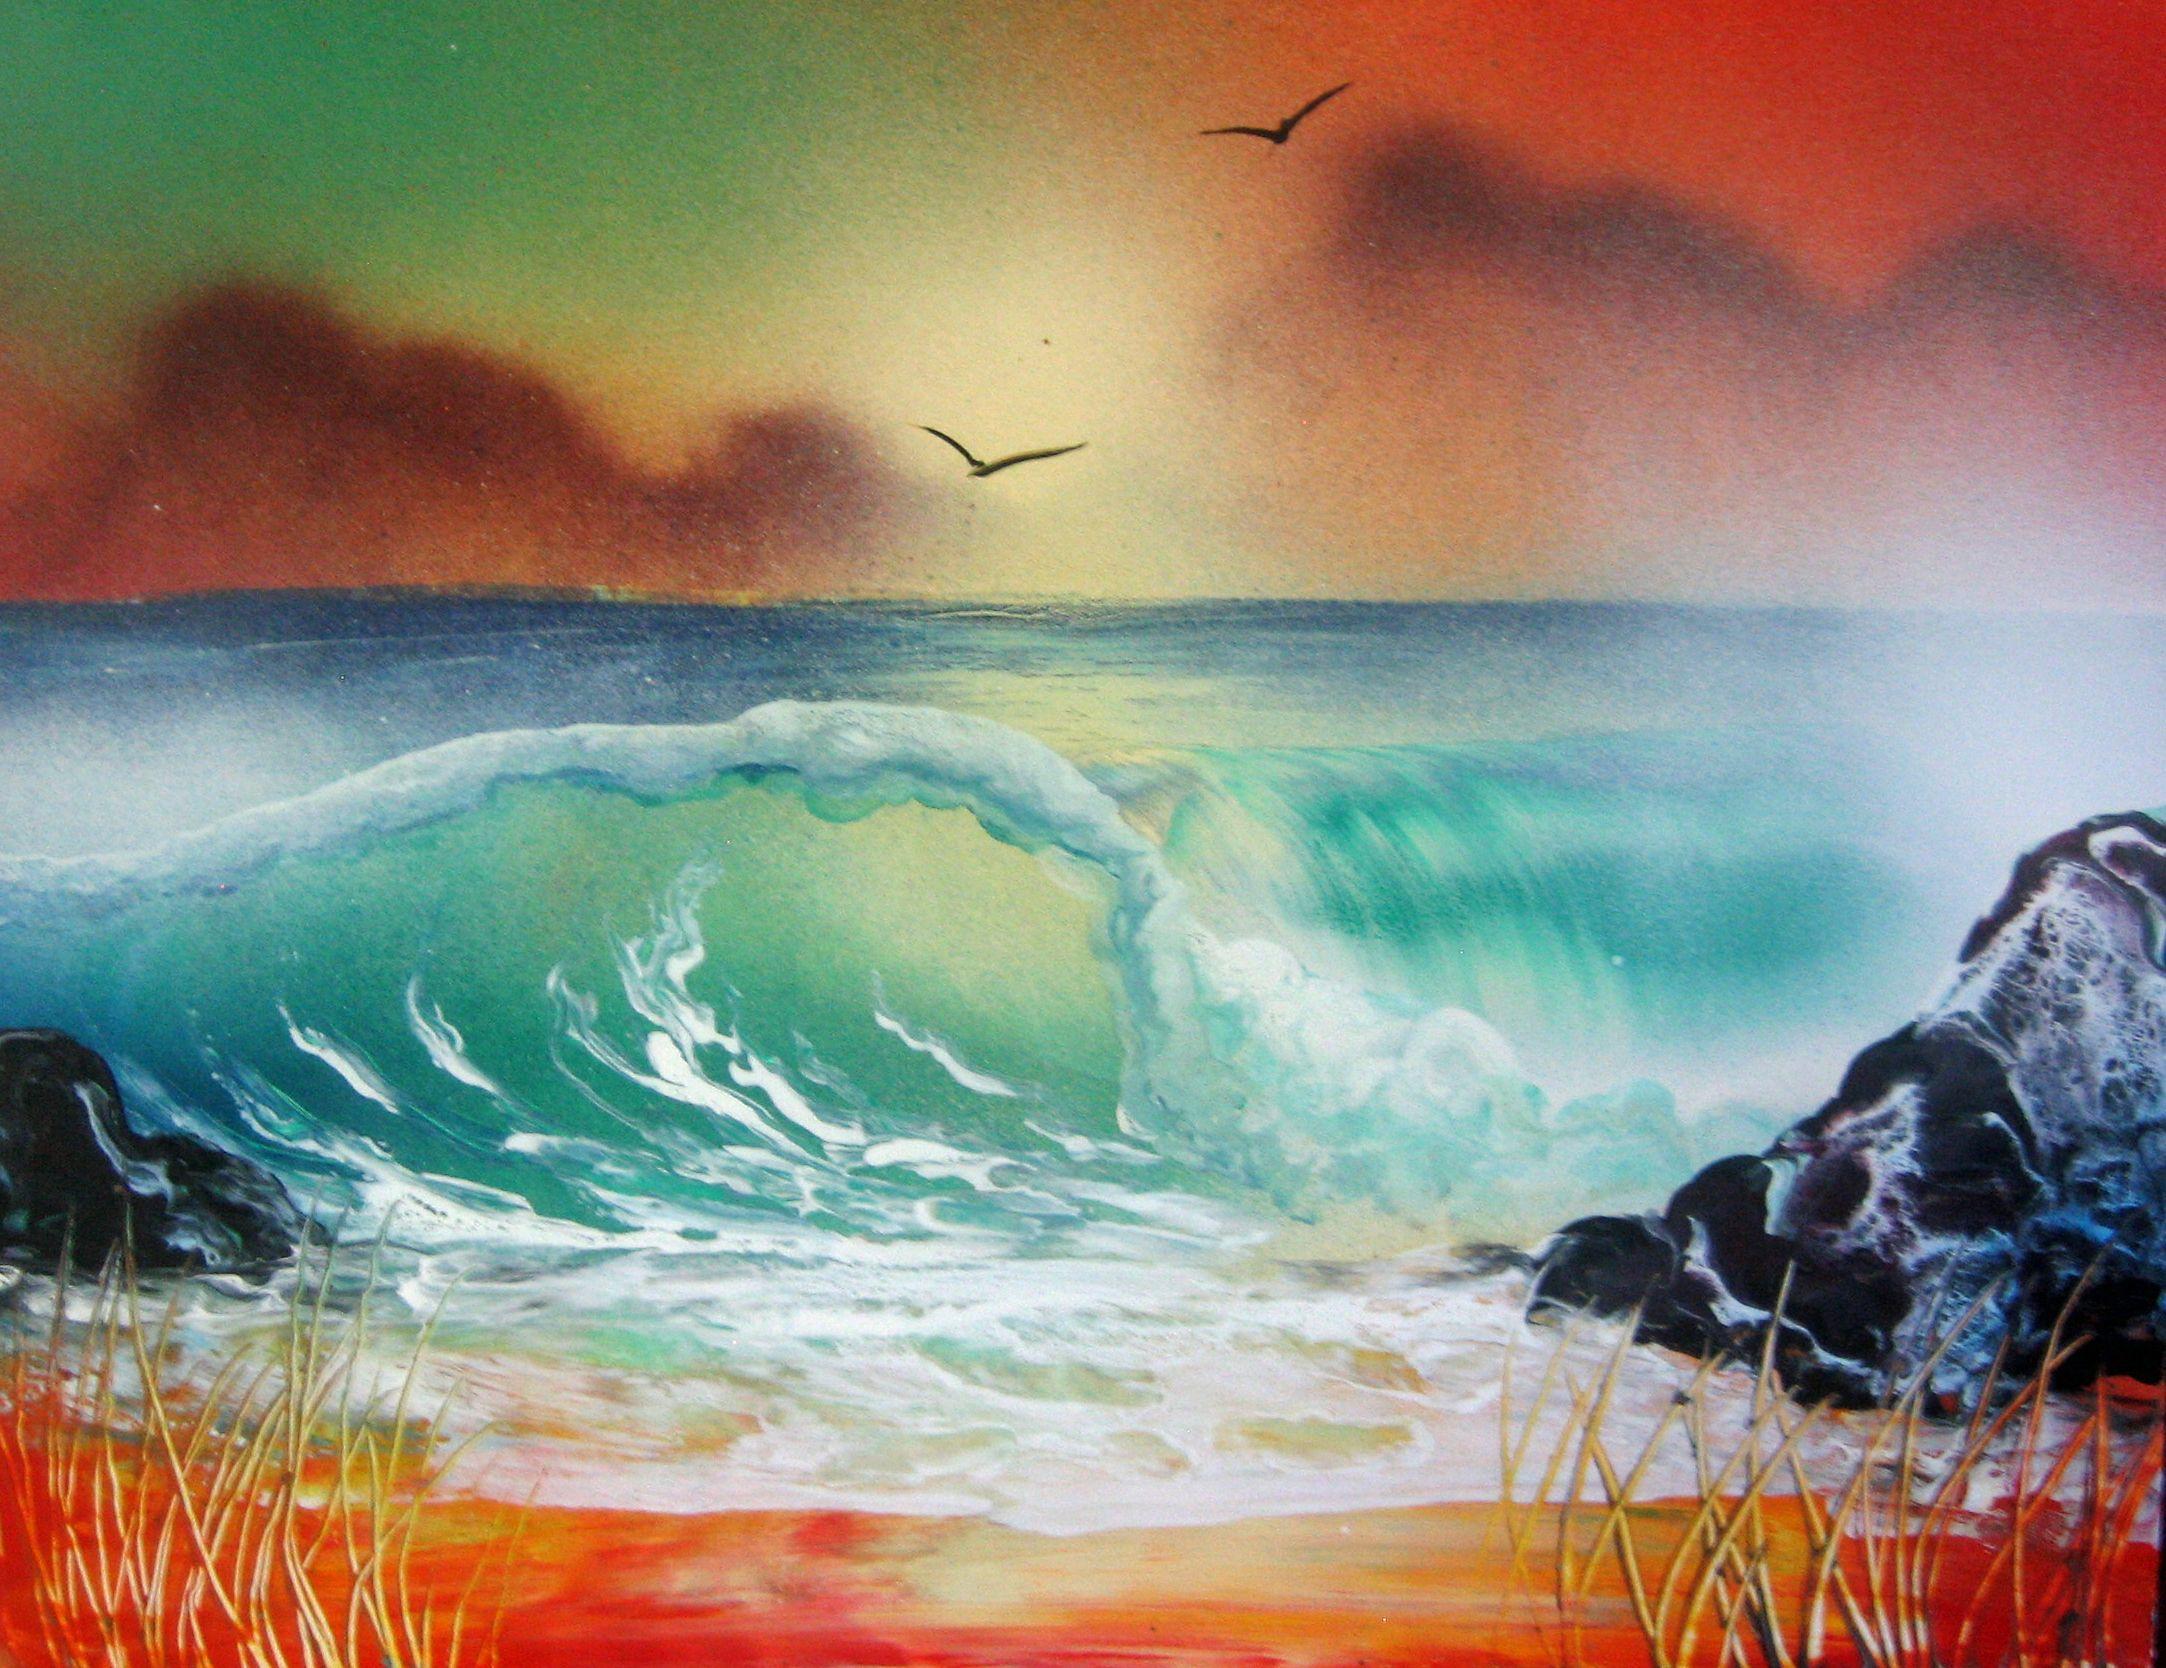 underwater purchase spray paint art secrets spray paint art. Black Bedroom Furniture Sets. Home Design Ideas